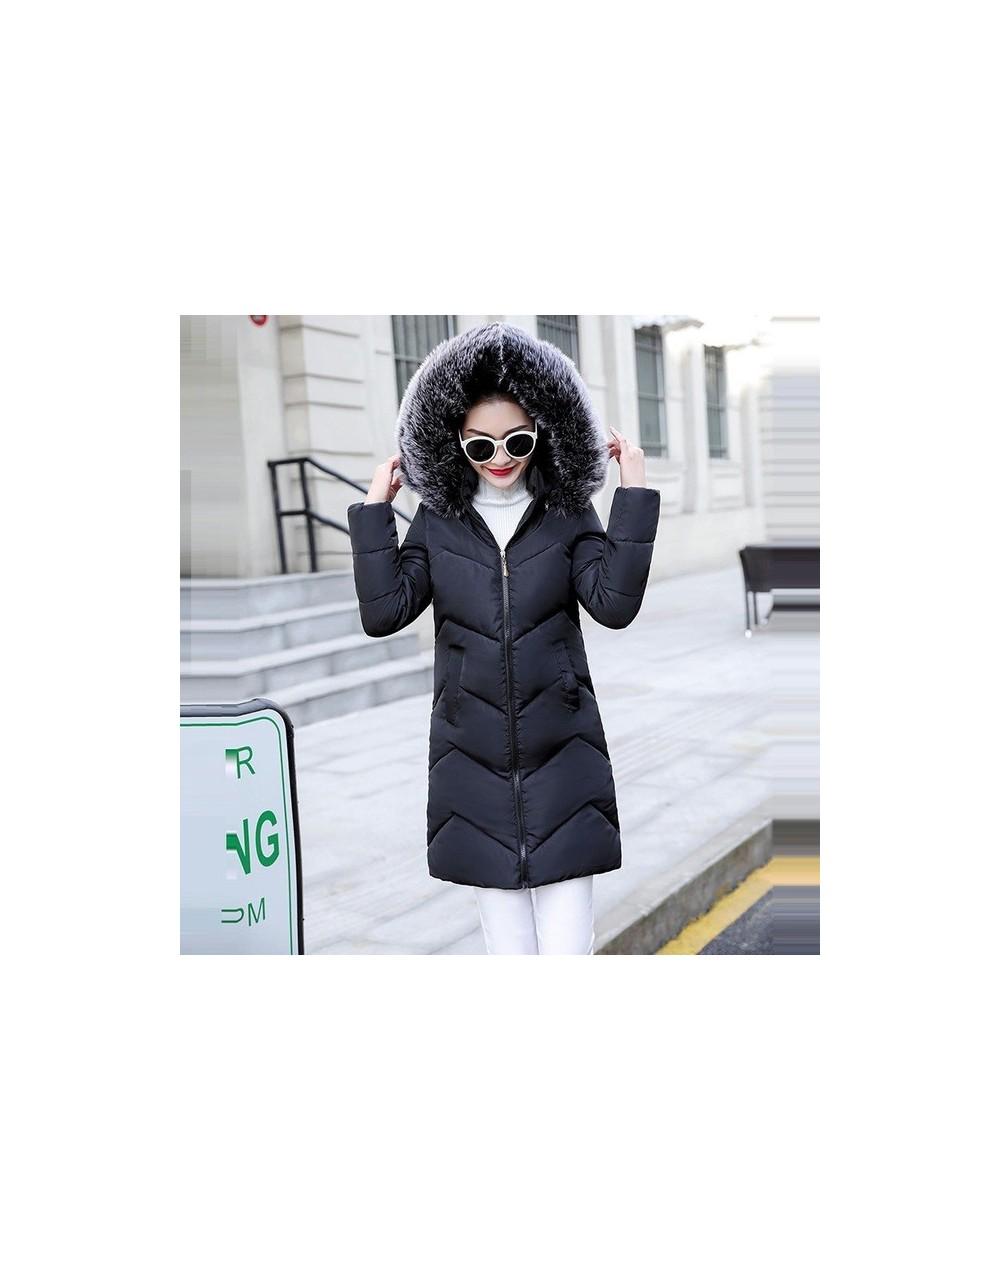 Fake Fur Parkas Women Down Jacket New 2019 Winter Jacket Women Thick Snow Wear Winter Coat Lady Clothing Female Jackets Park...